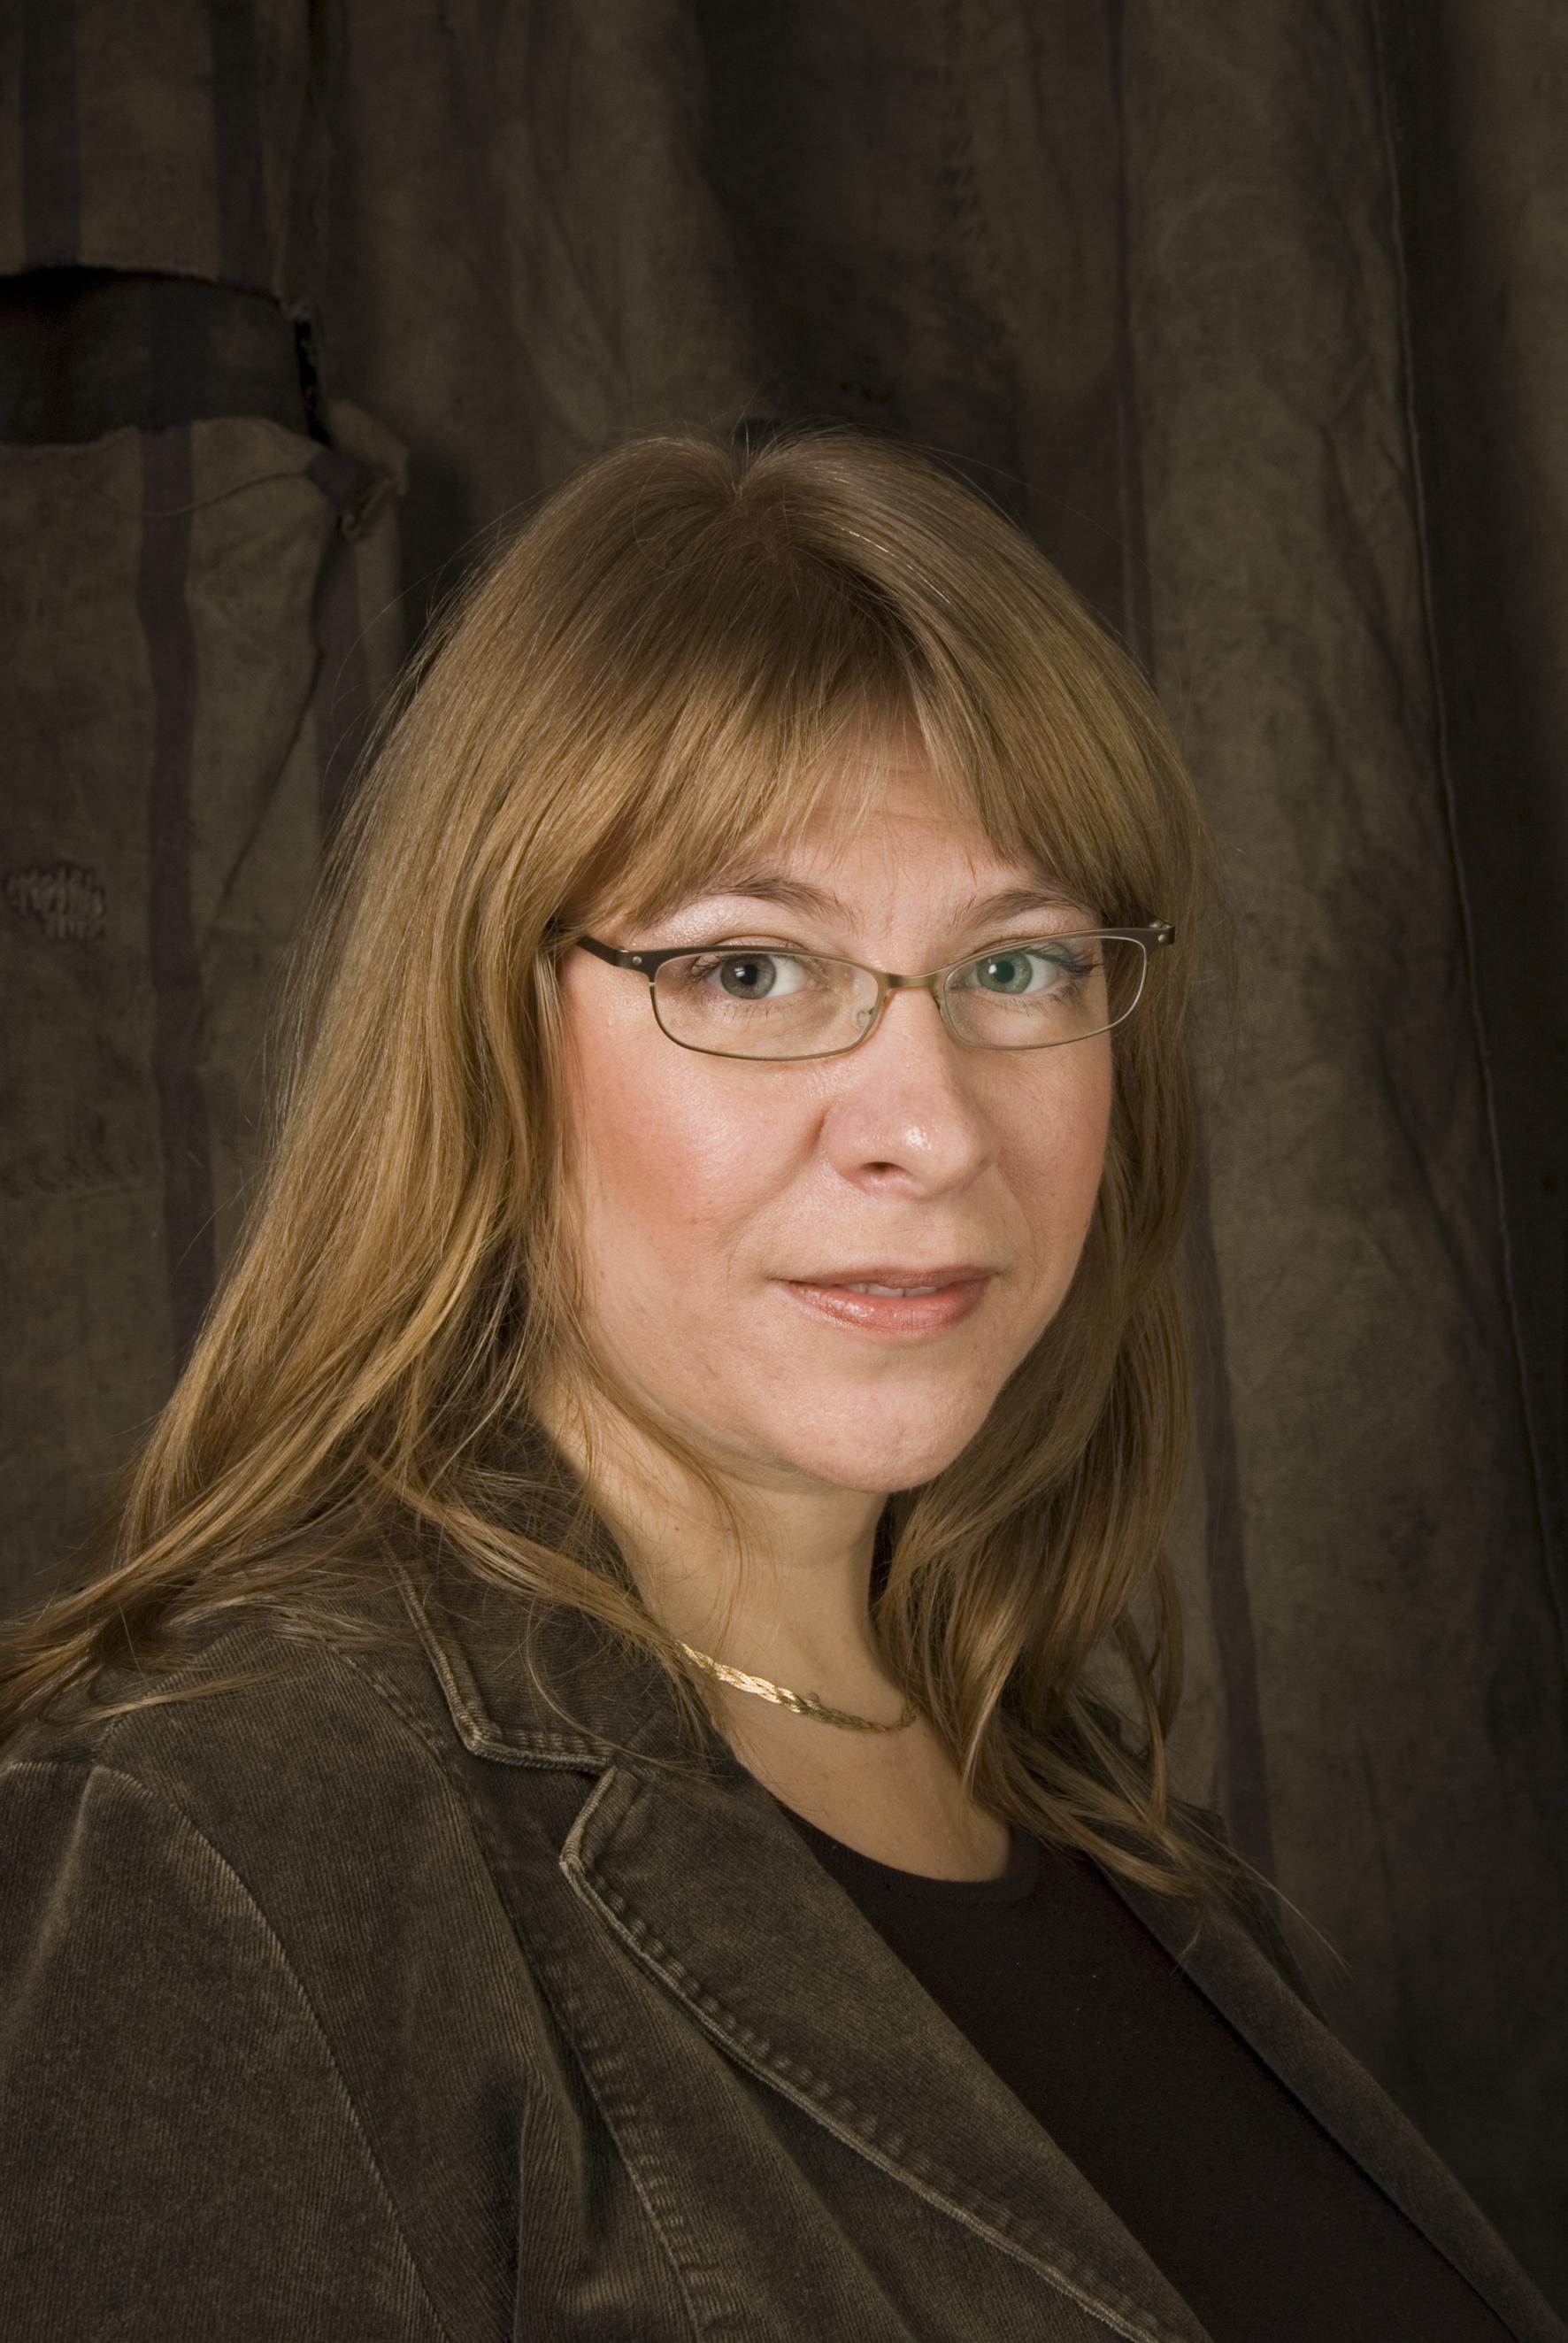 Jenny Larsson Foto: Jan Nordén - LarssonJenny_FotoJanNorden